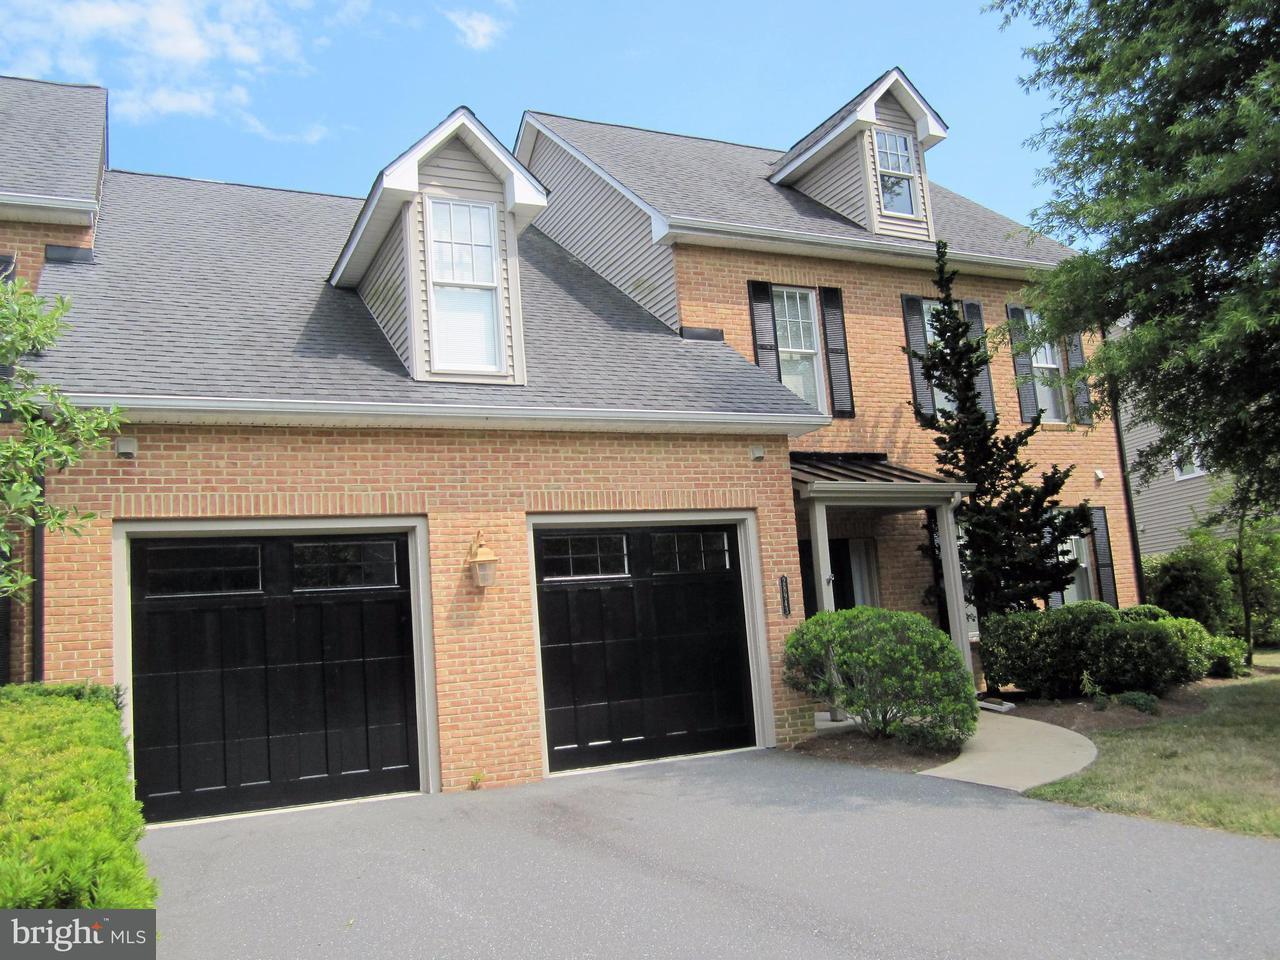 Townhouse for Sale at 28943 JASPER Lane 28943 JASPER Lane Easton, Maryland 21601 United States